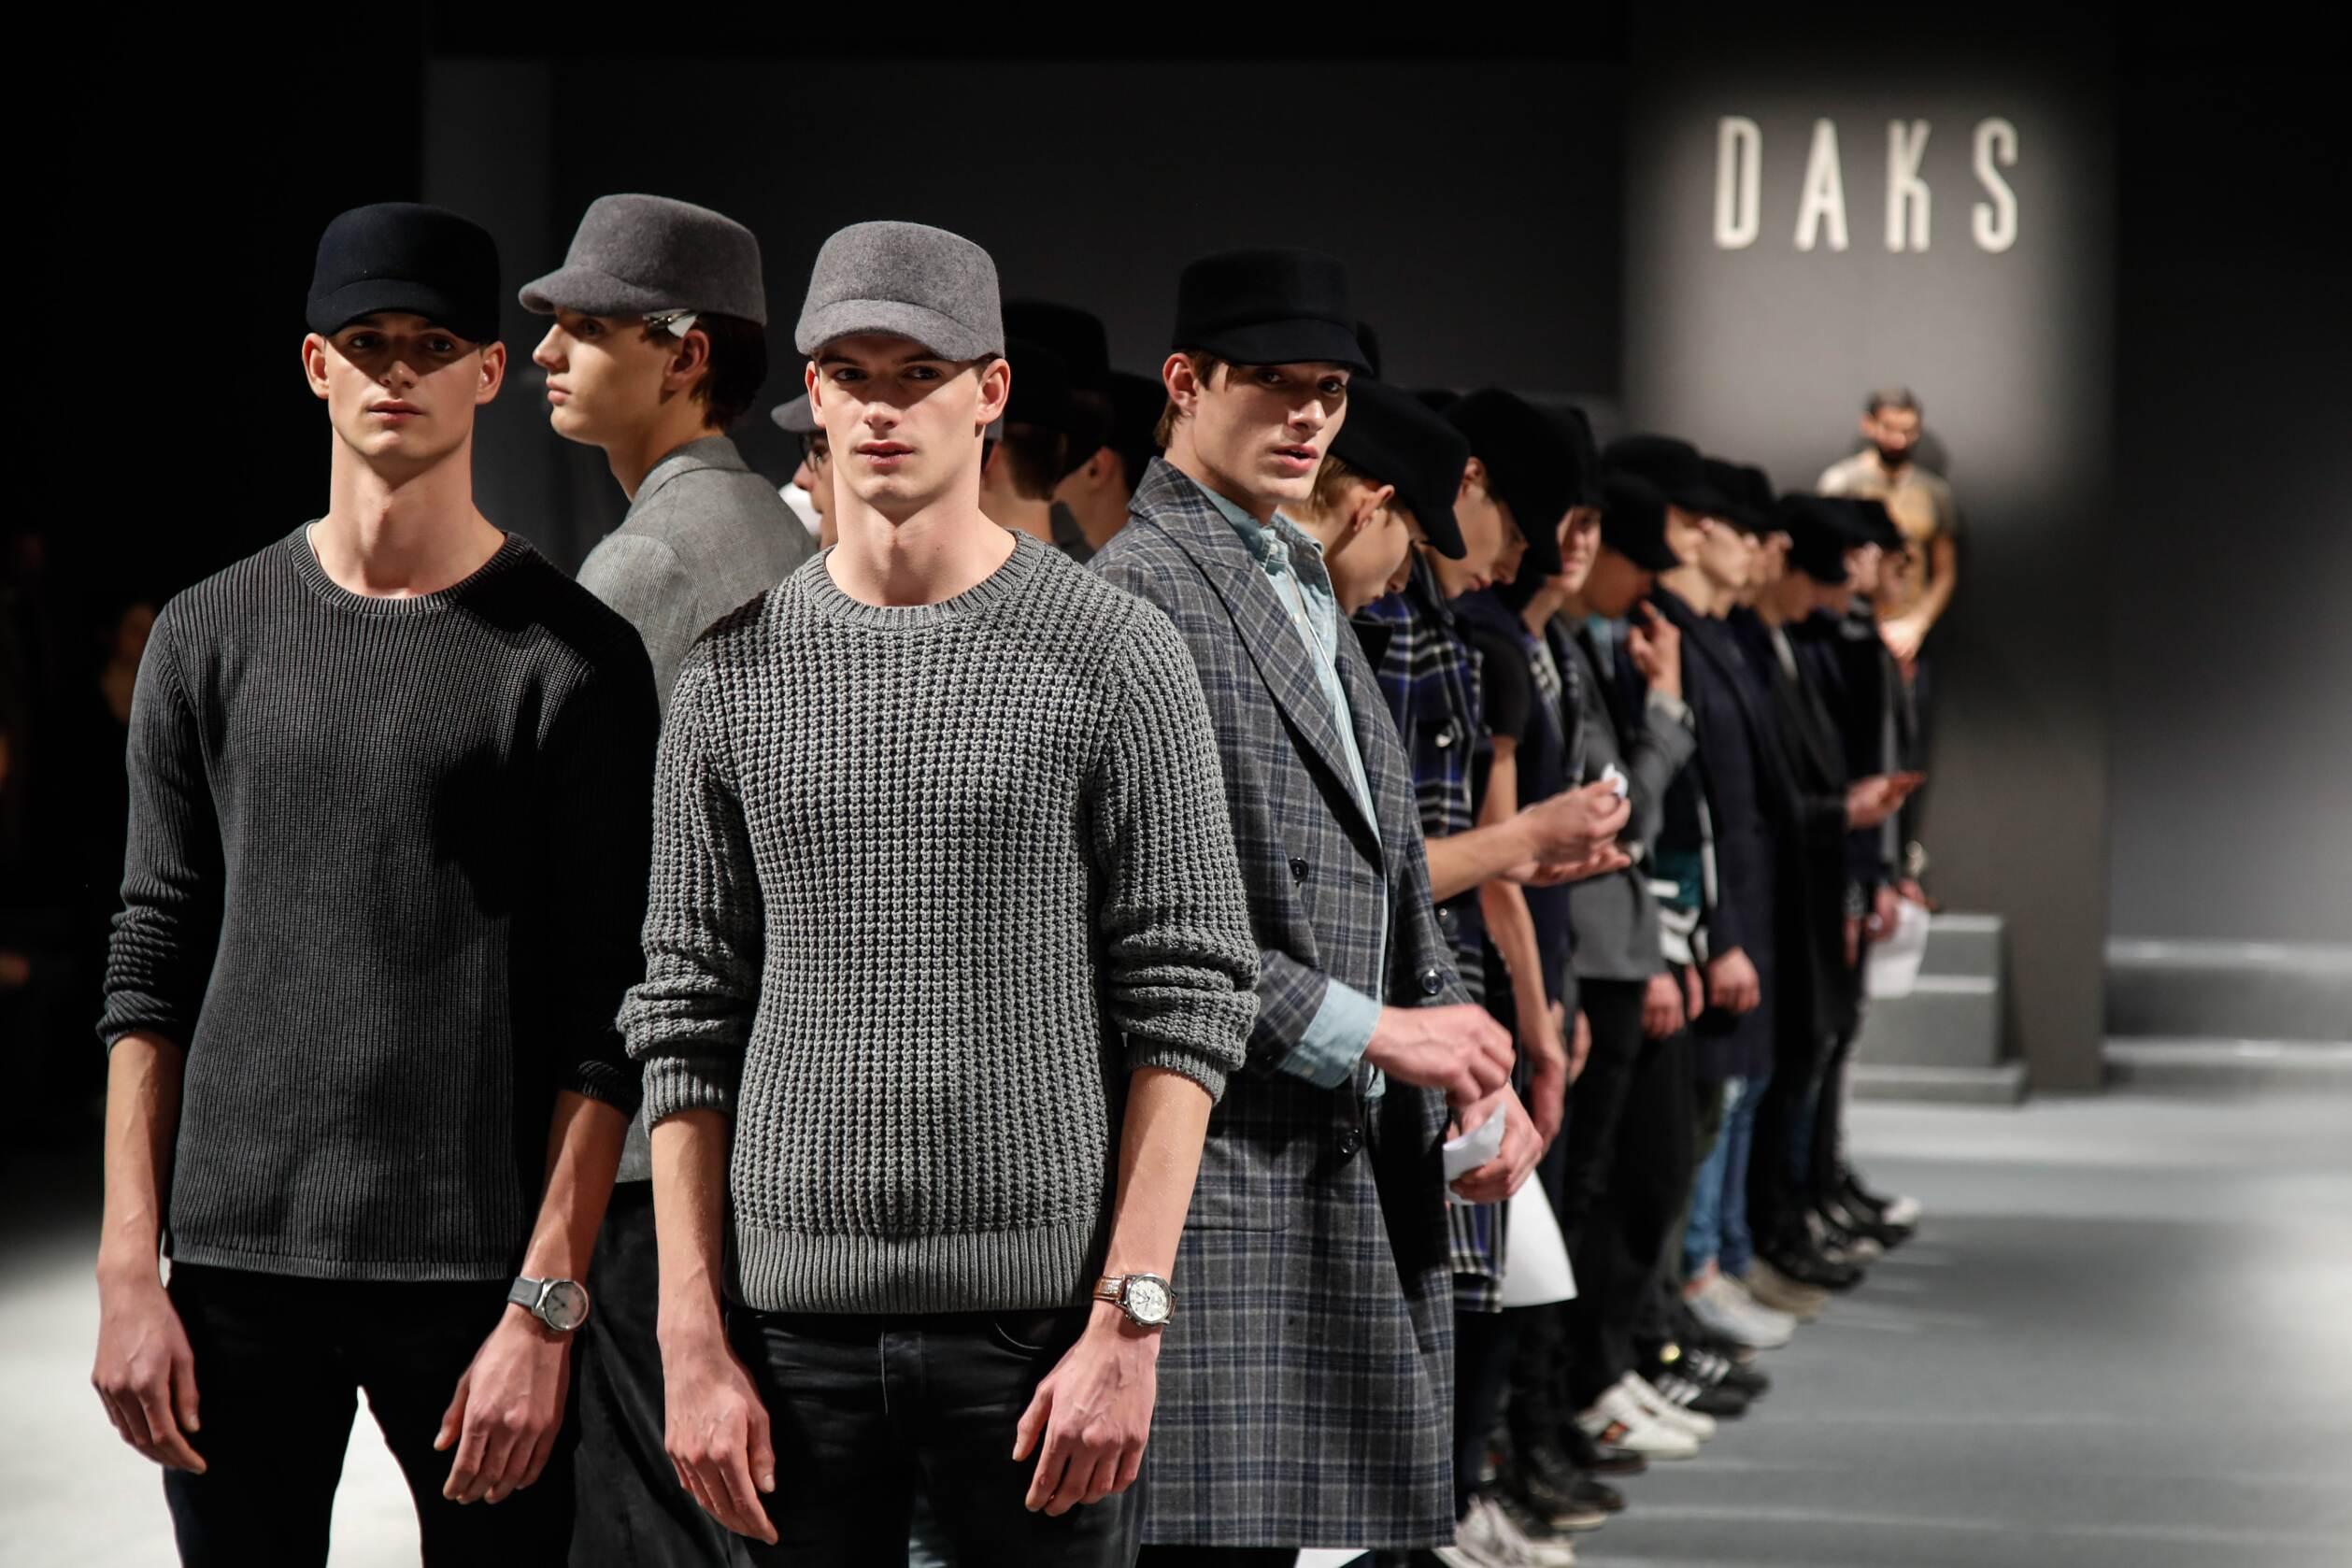 FW 2017-2018 Backstage Daks Models